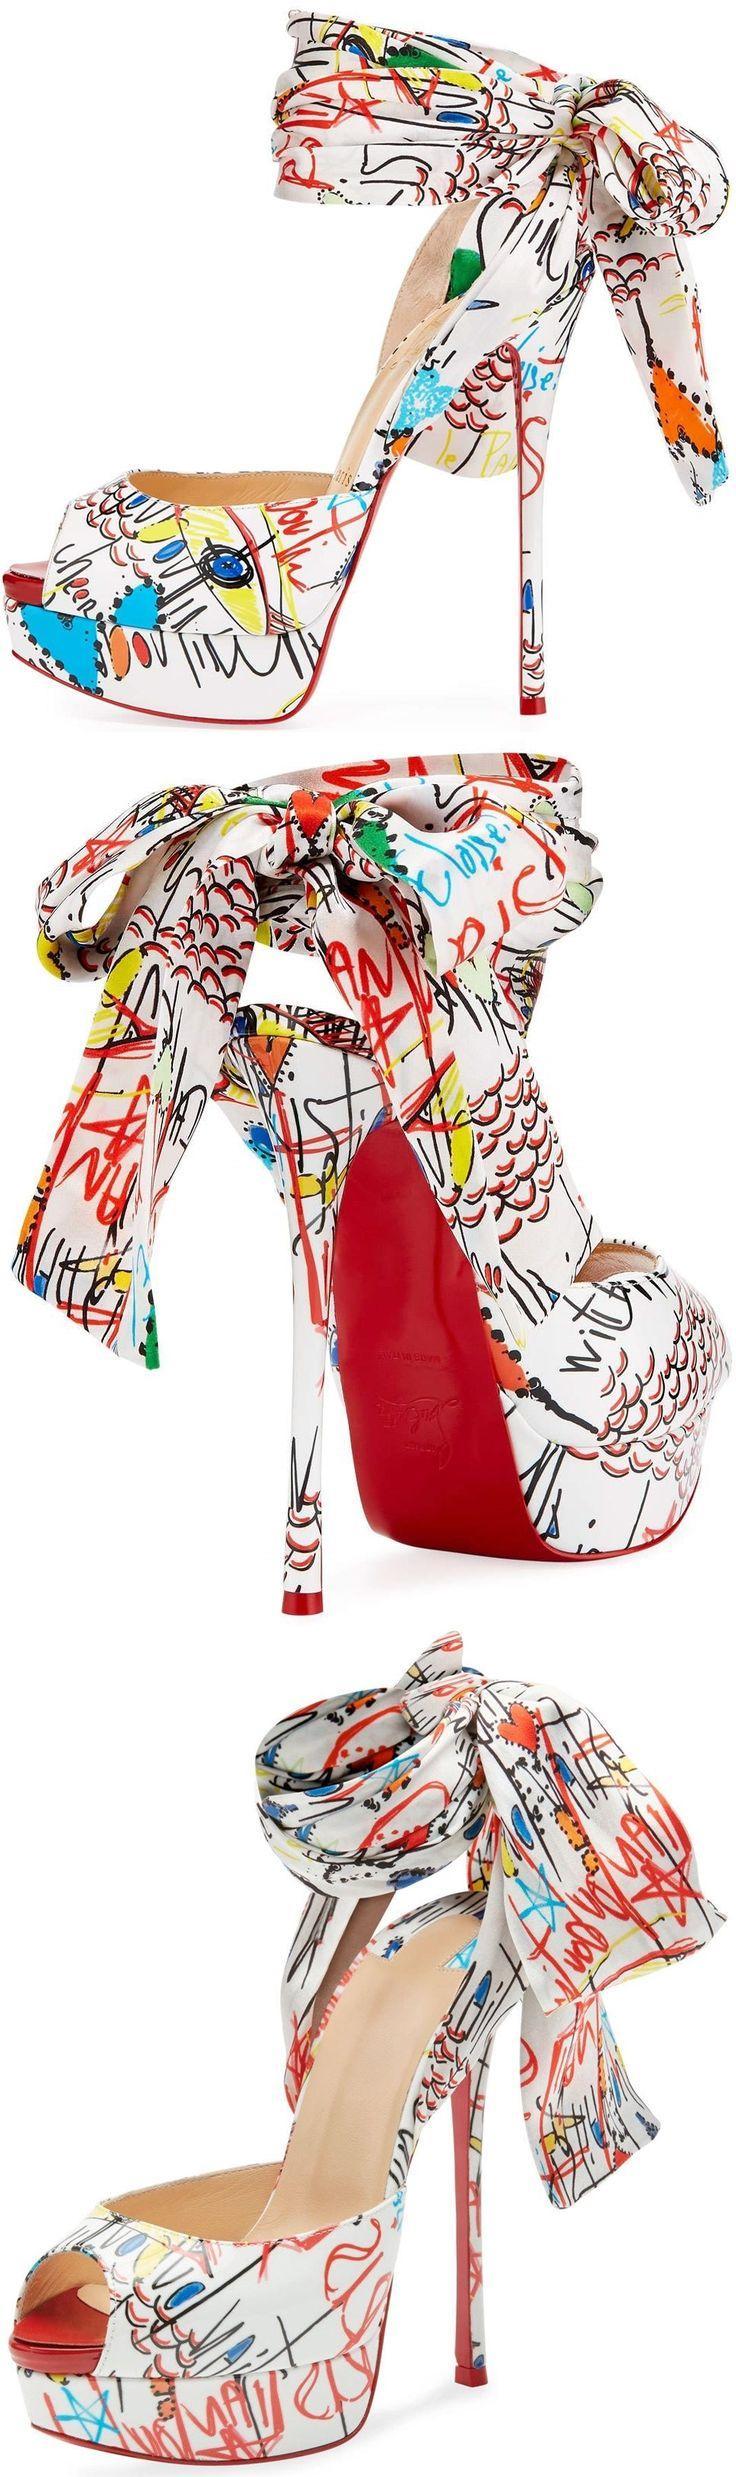 Wedding - Jersey Loubitag Platform Red Sole Sandal